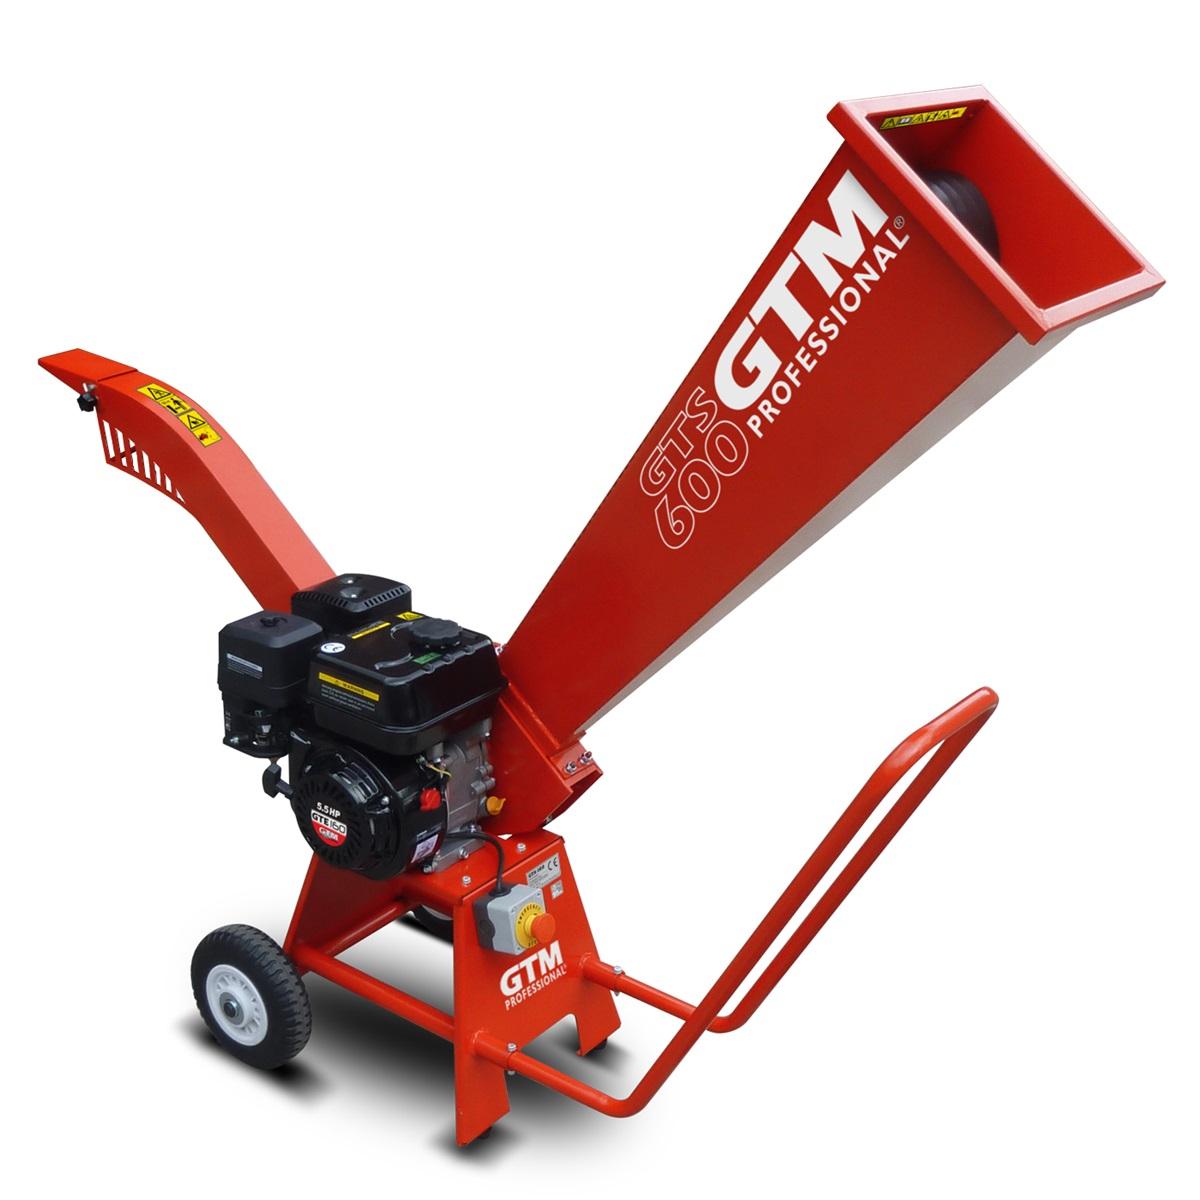 drtič dřeva s benzinovým motorem GTM GTS 600